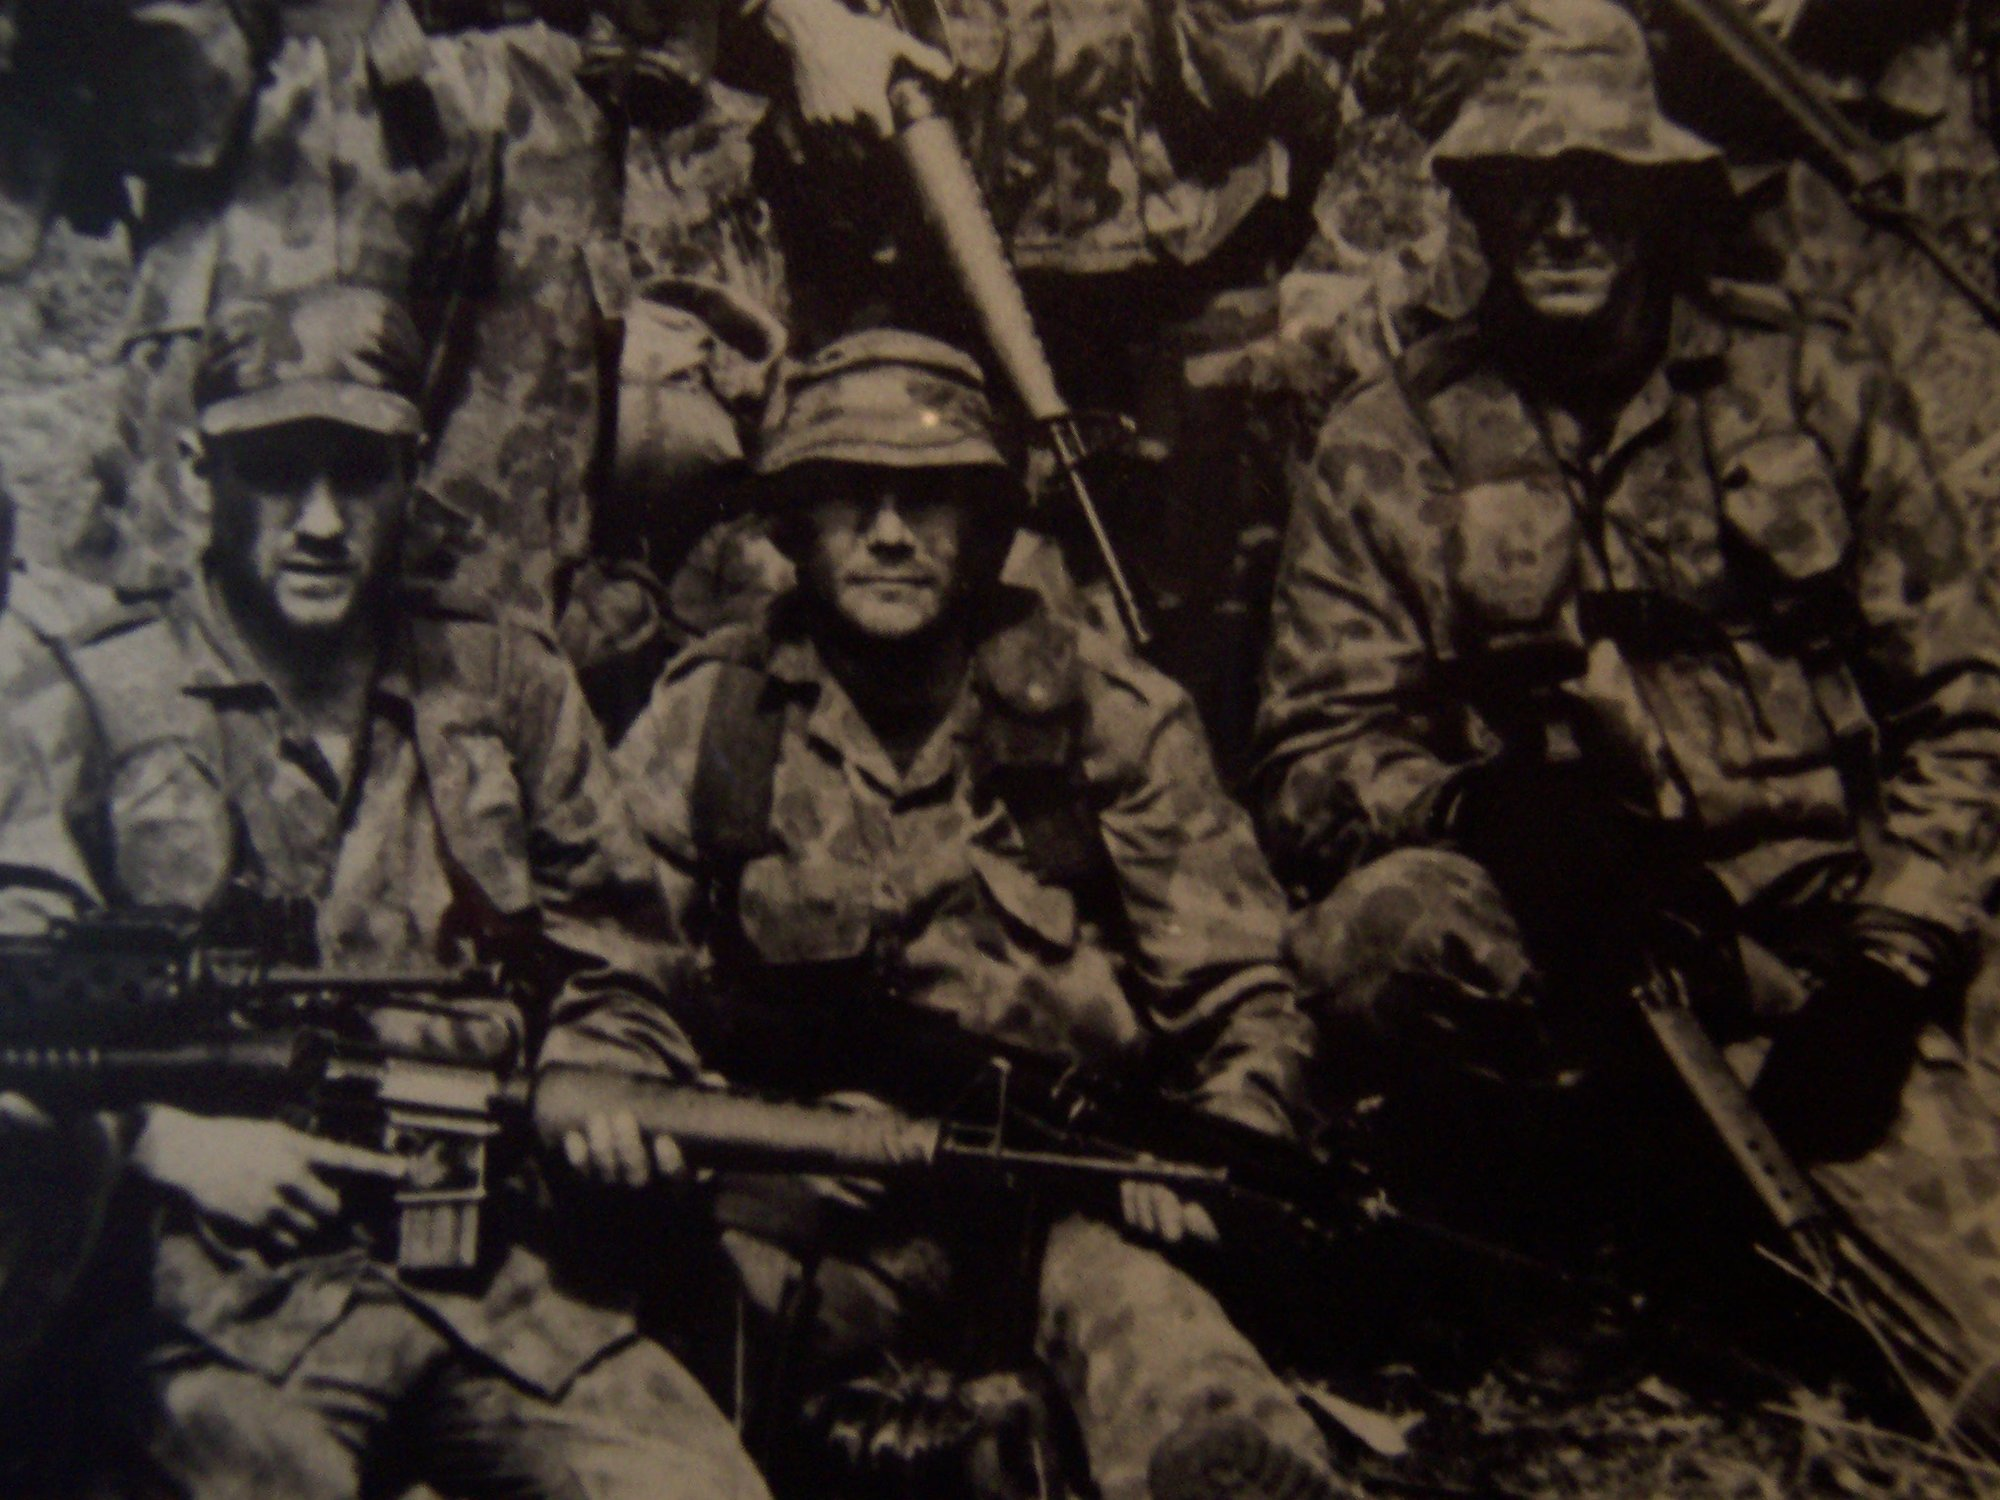 6th Platoon 2 CDO Coy 1991 006.jpg